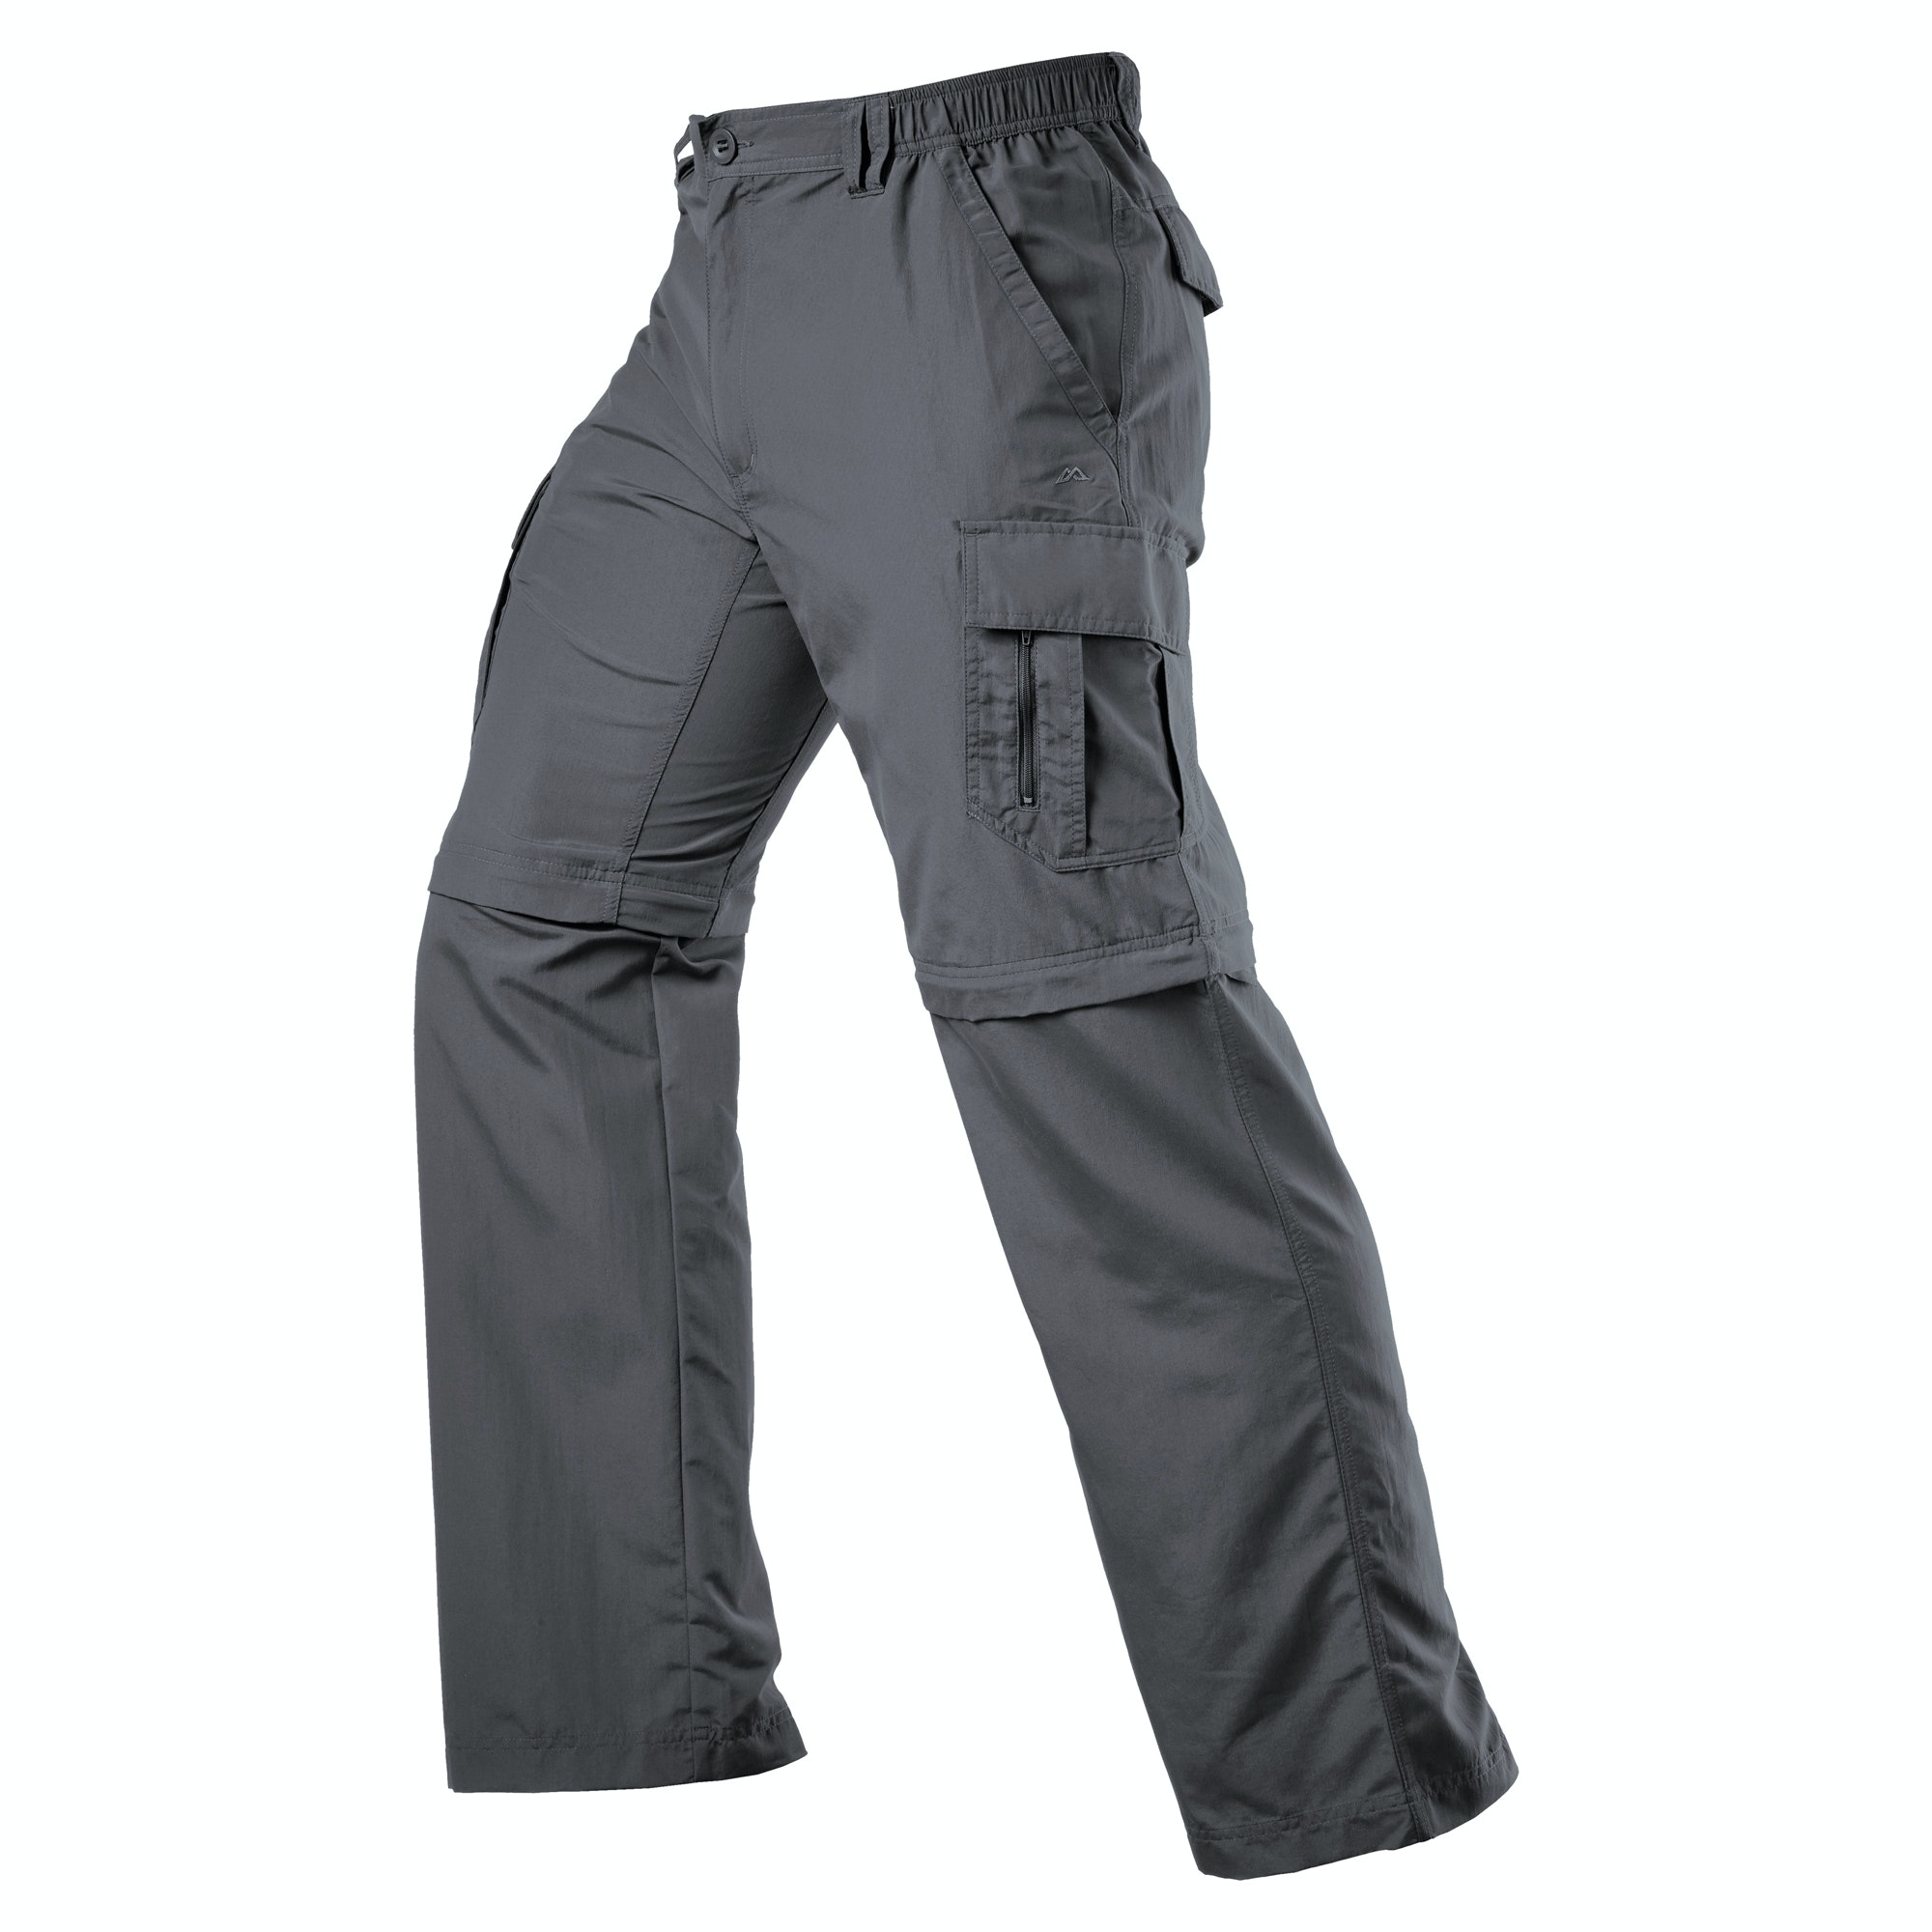 Kathmandu Kanching Leichte Zip Zip Zip Off Hose für Herren NEU e60dcf